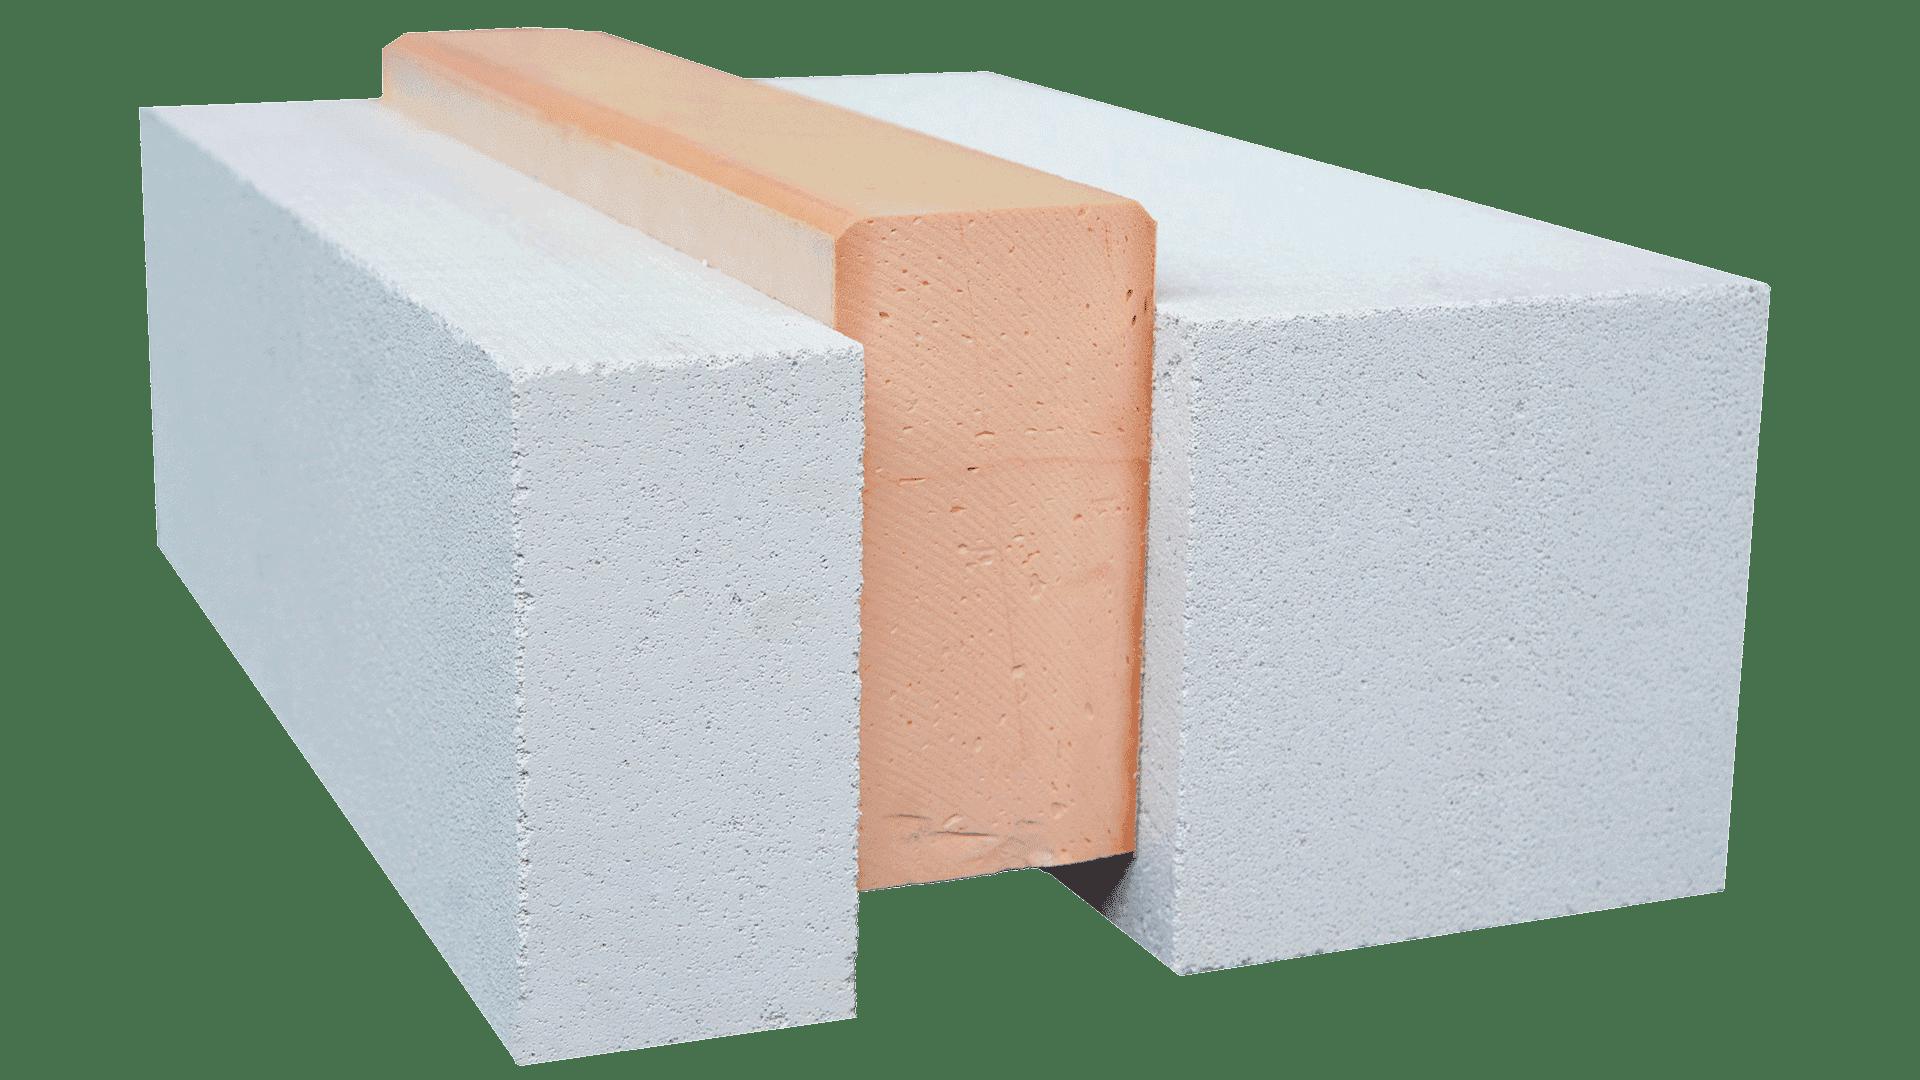 Legiso cellenbeton bouwblok